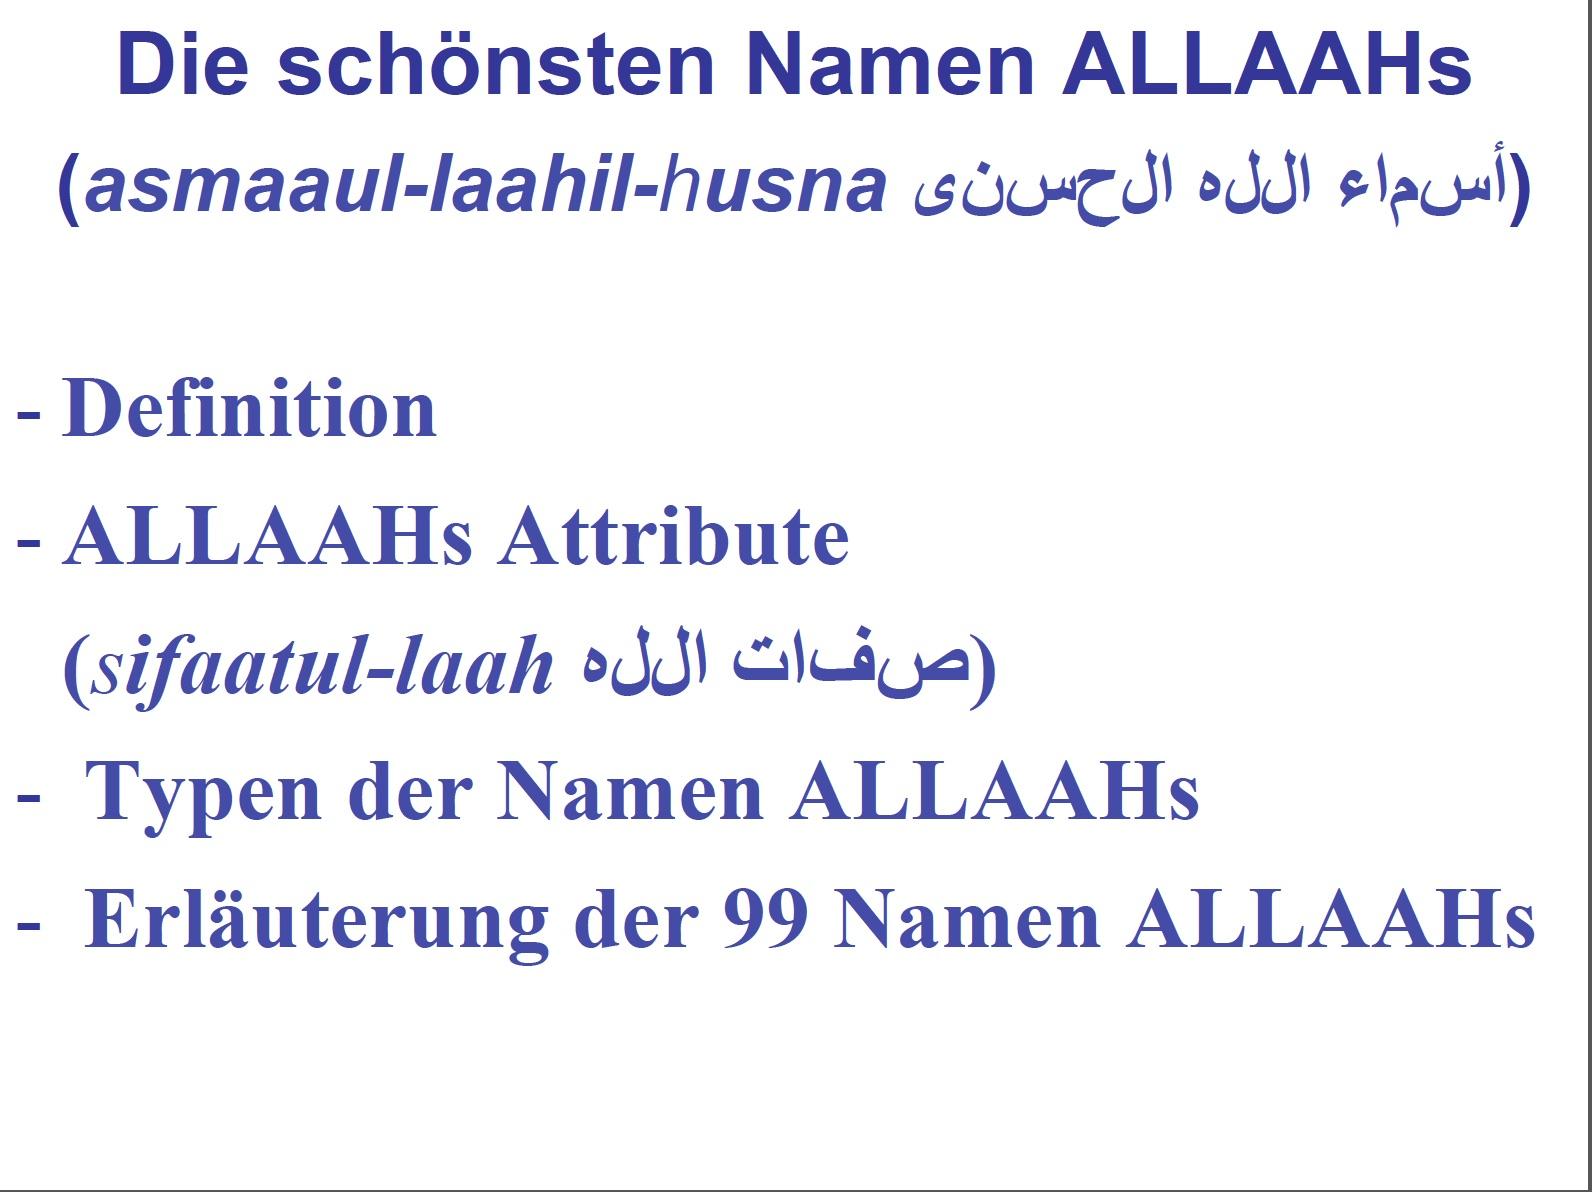 NamenAllahs